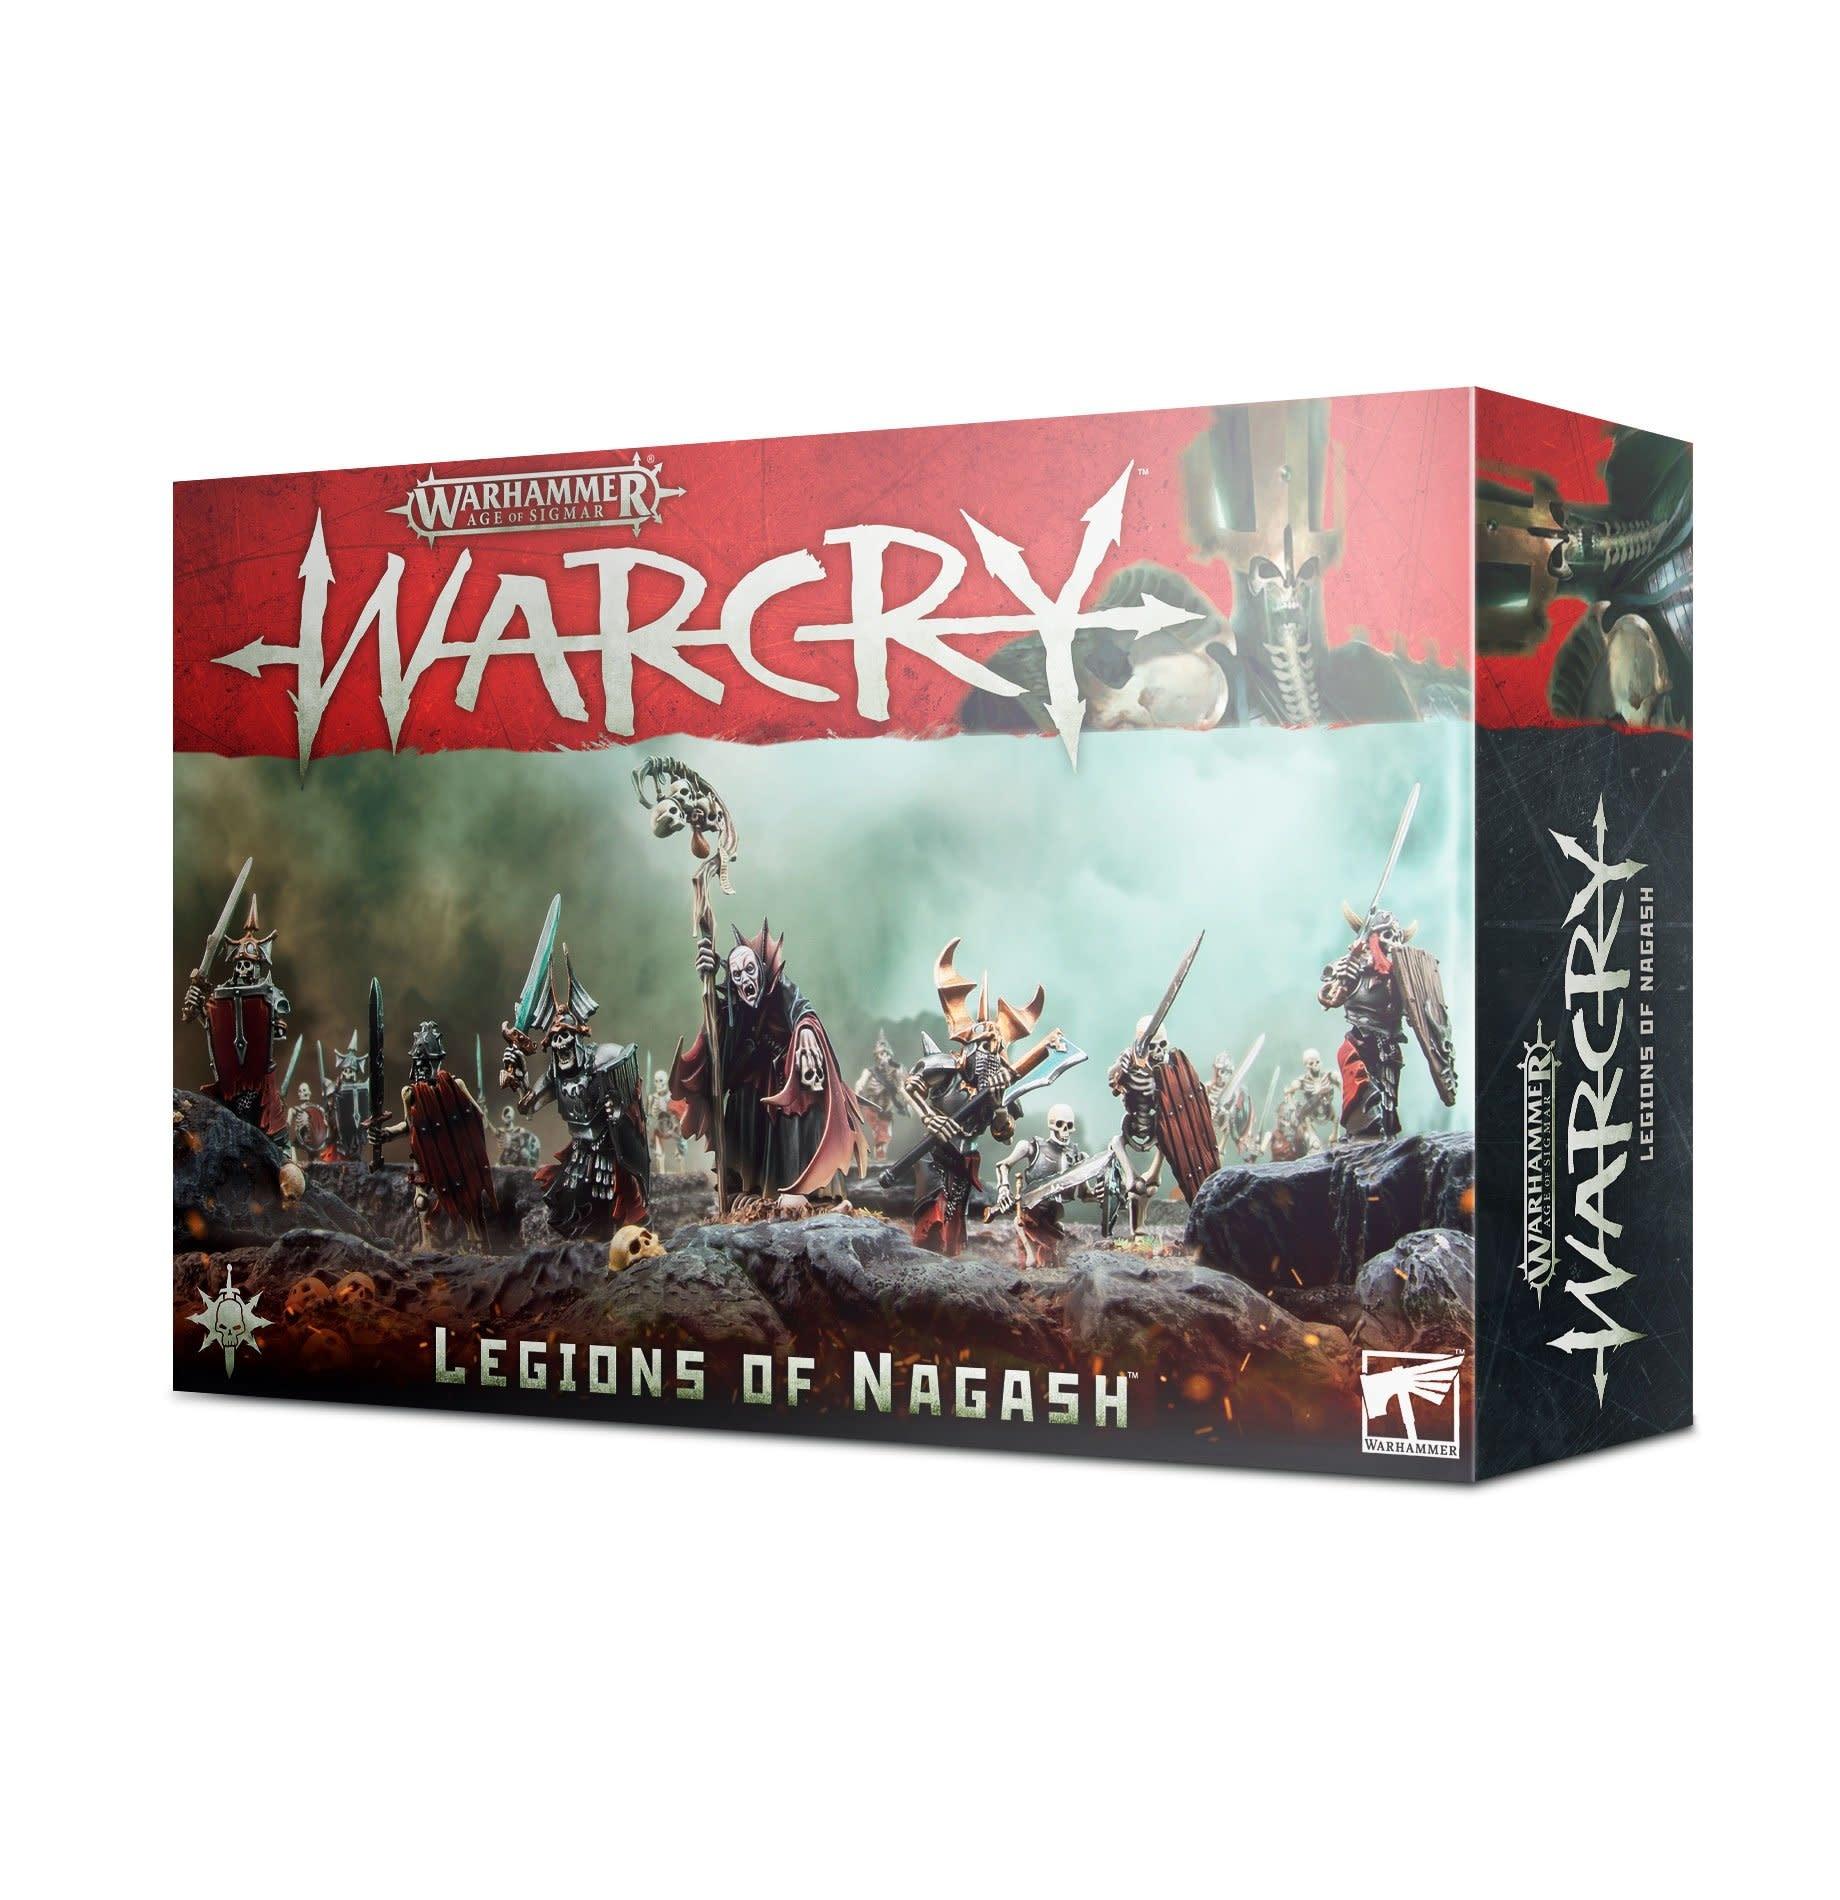 Games-Workshop Warcry: Legions of Nagash